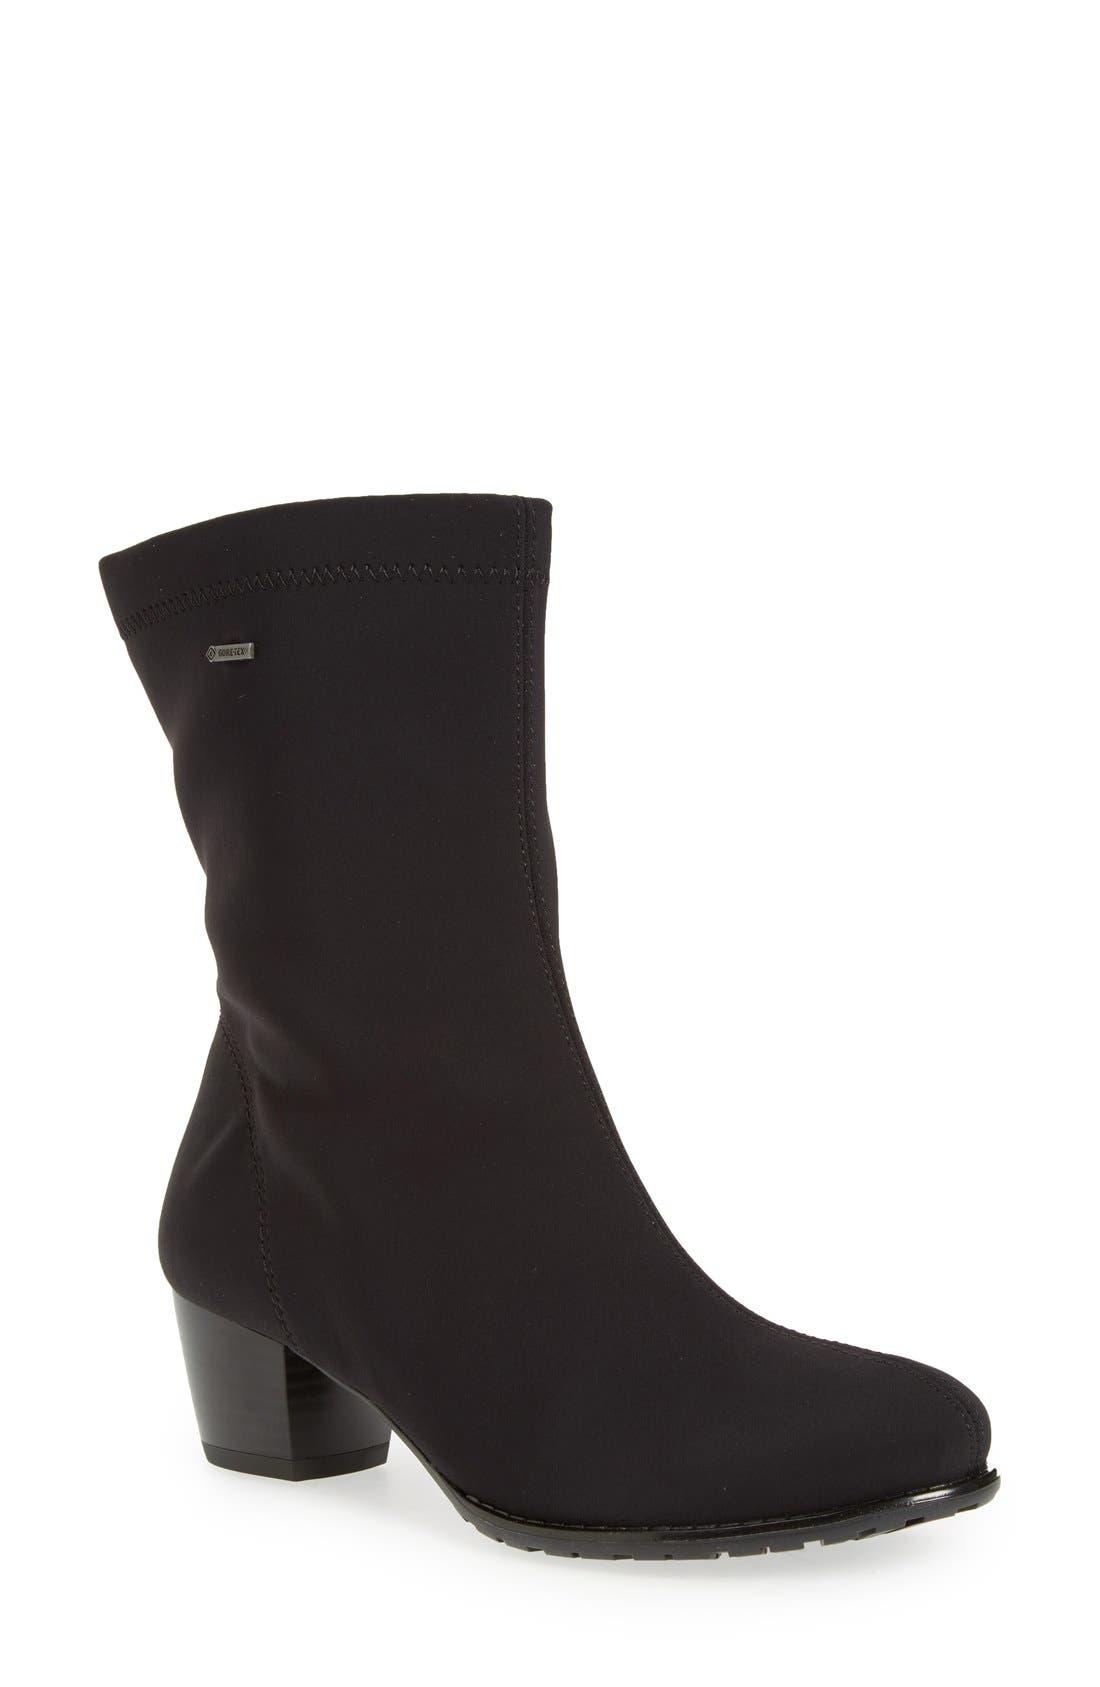 'Fairfax' Waterproof Gore-Tex<sup>®</sup> Block Heel Boot,                         Main,                         color, Black Fabric